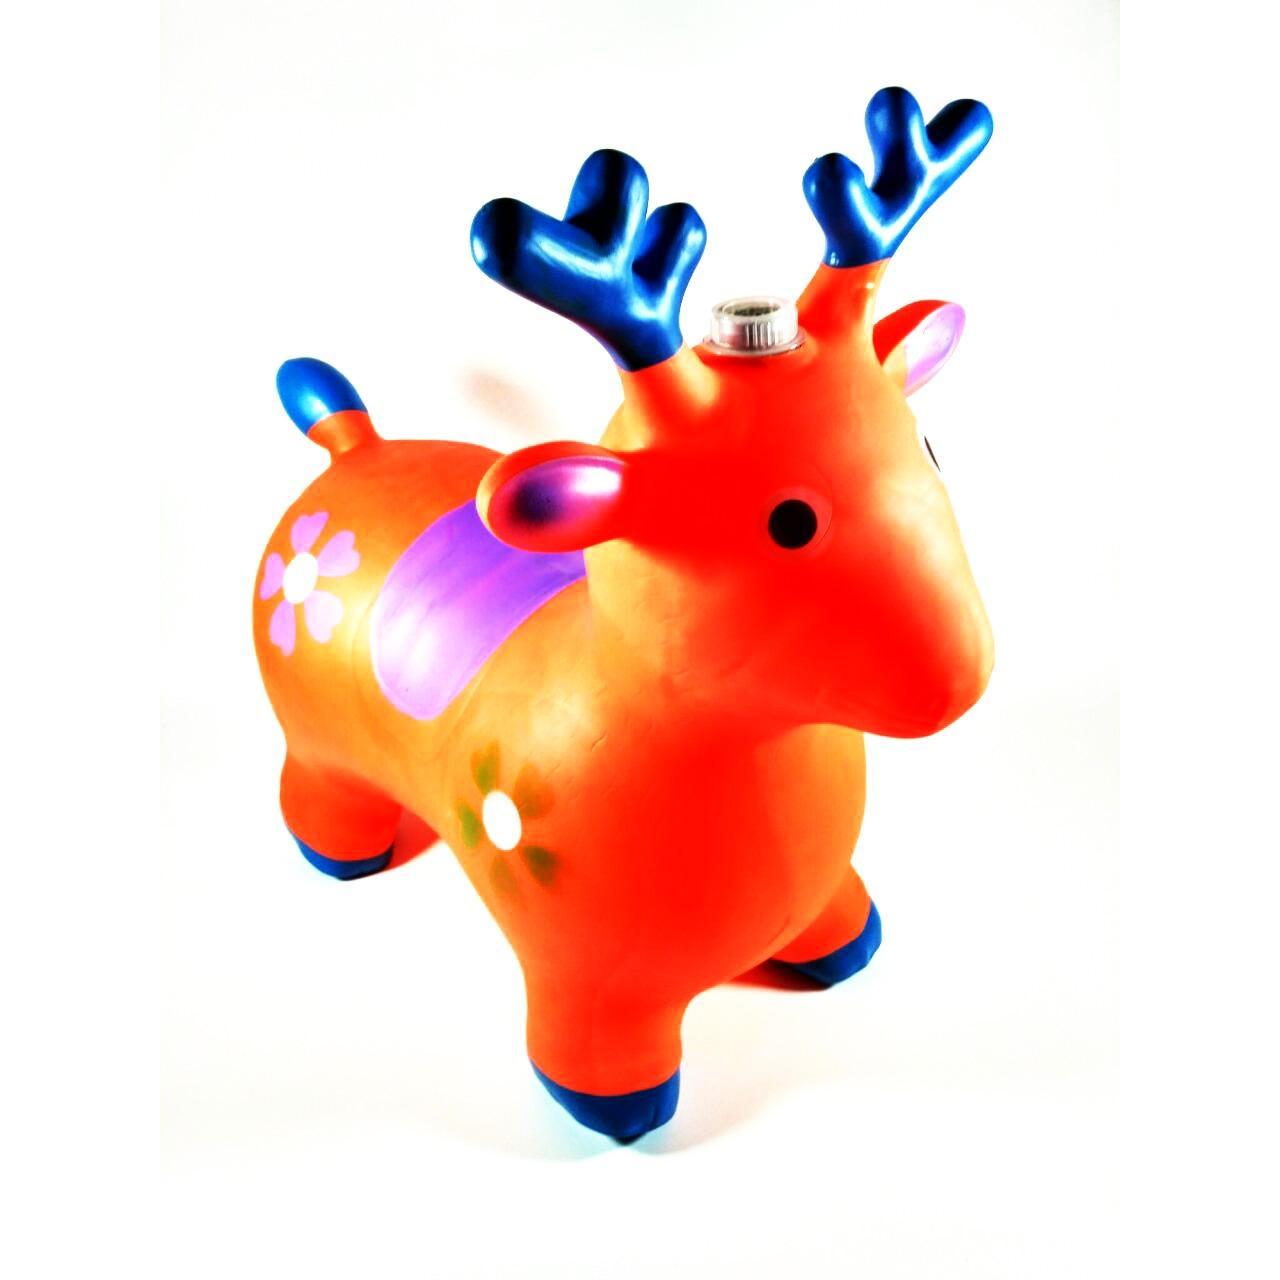 Informasi Harga Terupdate Mainan Anak Kuda Kudaan Bulan November Kp 582 Sepeda Mobil Dorong Shp Toys Orange Jumping Animal Musik Dan Lampu Tunggang Karet